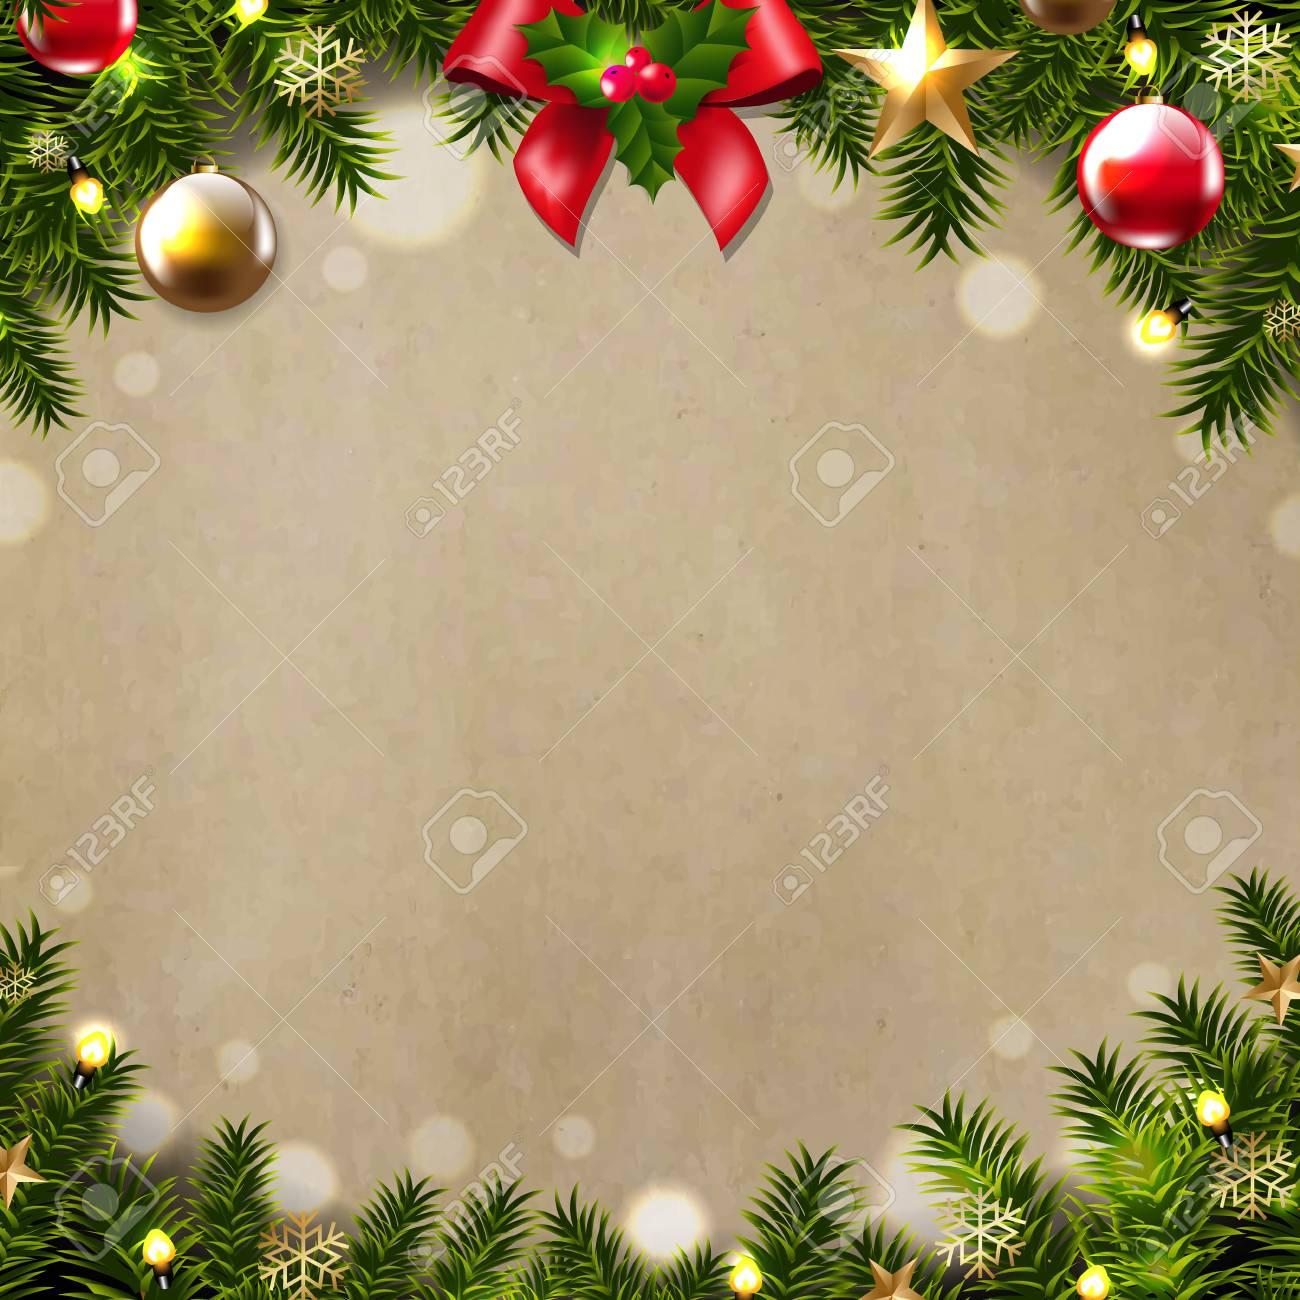 Christmas Border Design.Christmas Border Design